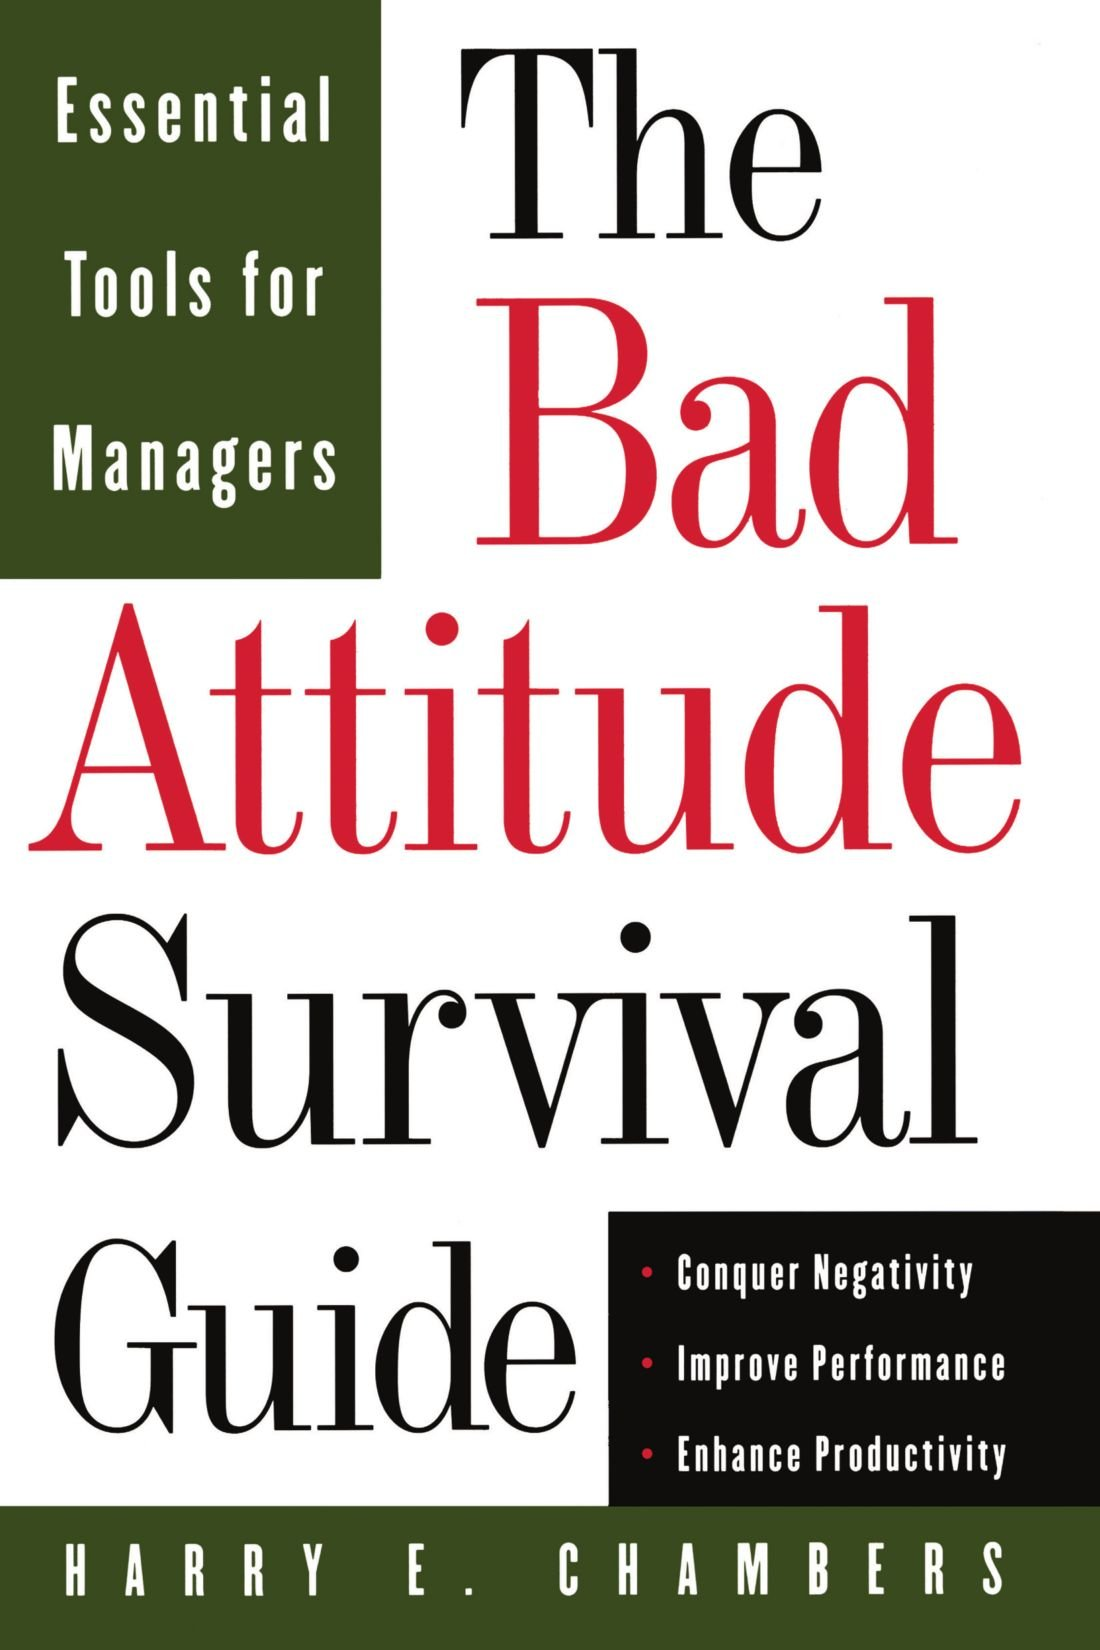 the bad attitude survival guide essential tools for managers the bad attitude survival guide essential tools for managers harry e chambers 9780201311464 com books